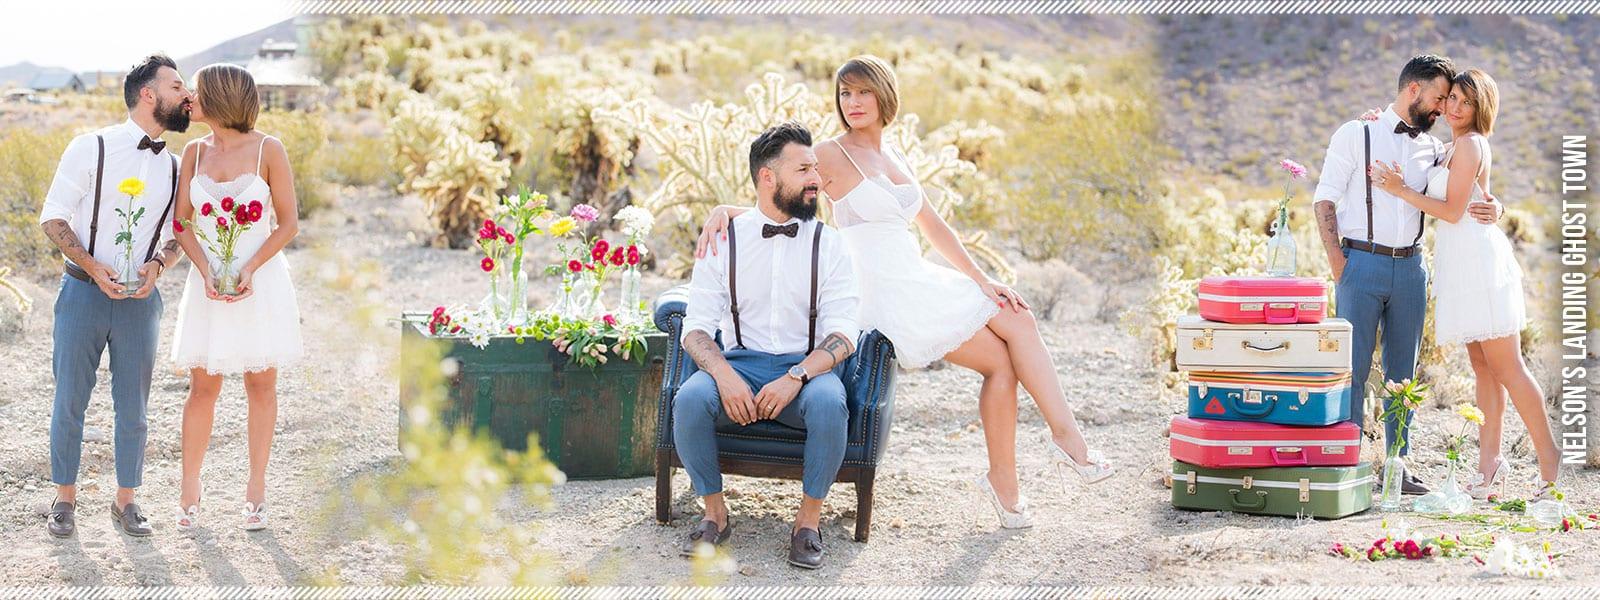 Nelson's Landing Photography | Wedding Photographer in Las Vegas